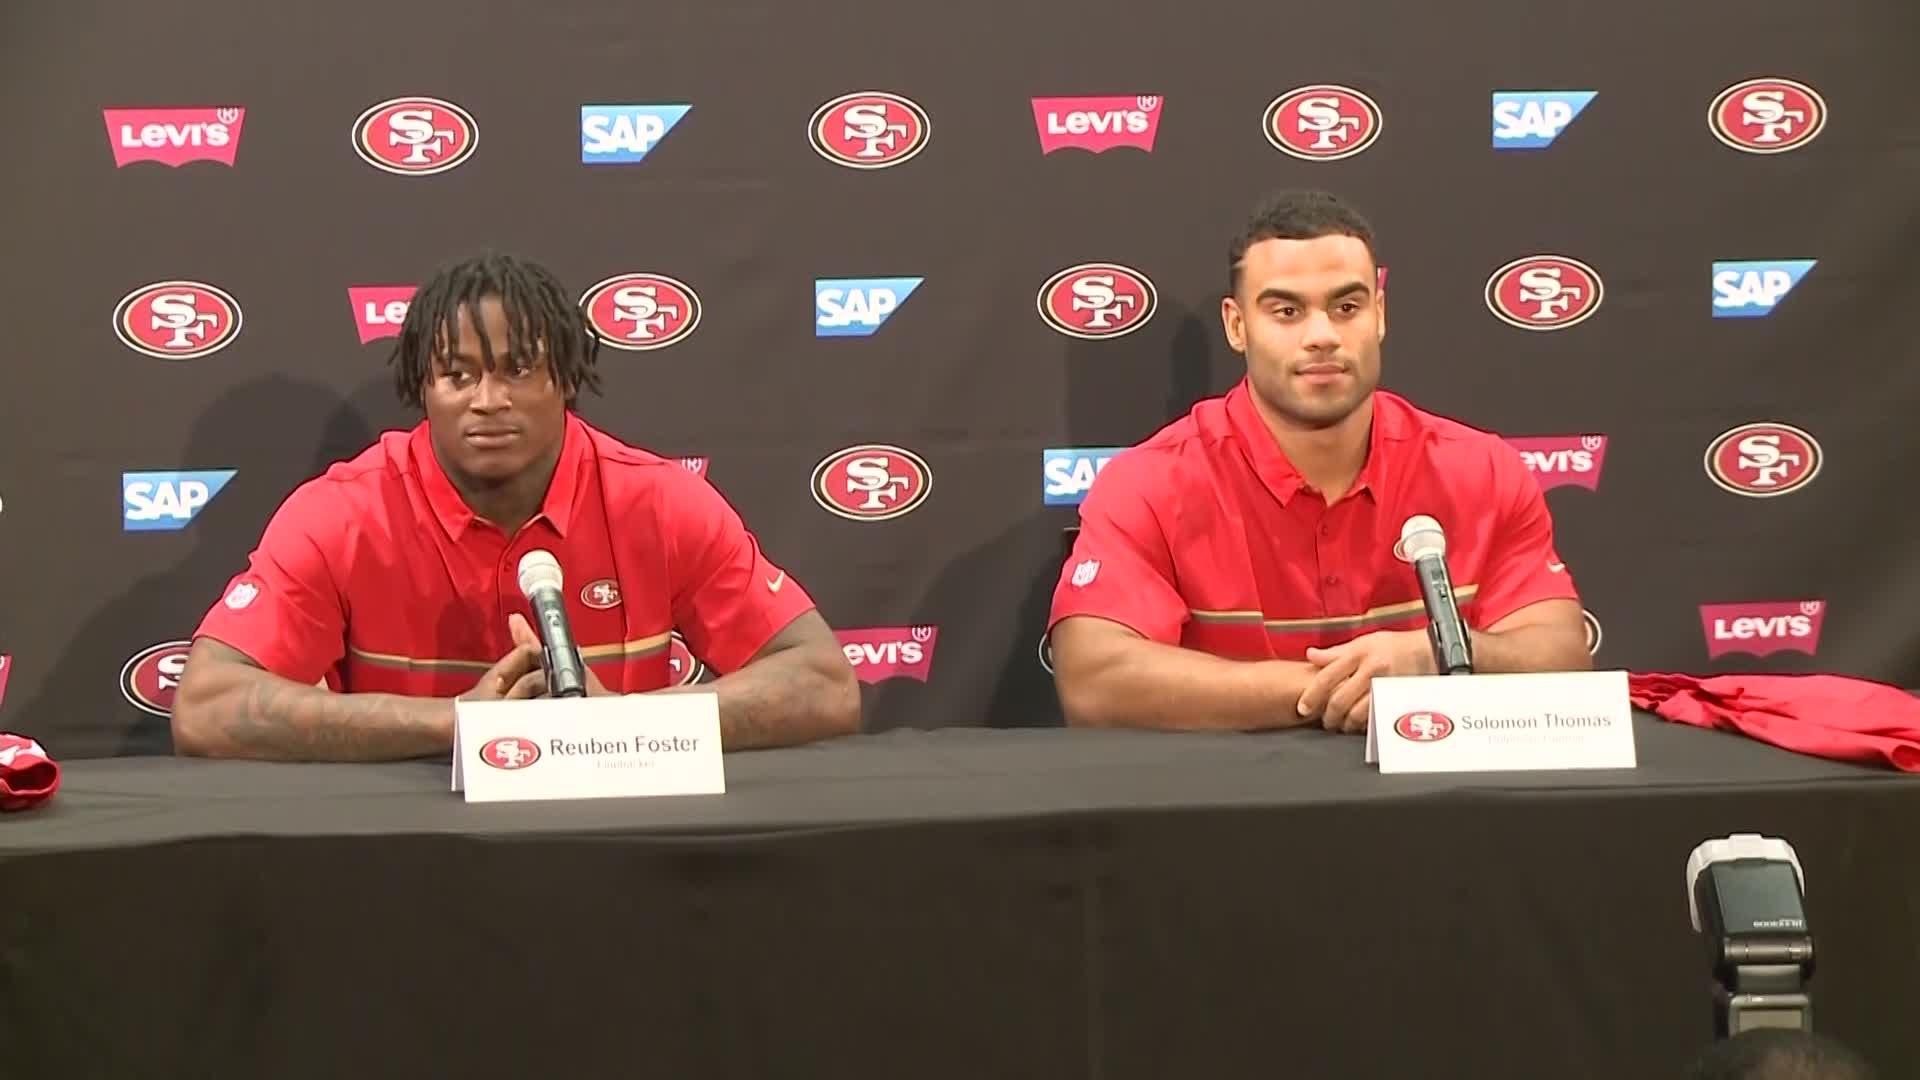 49ers introduce first round picks Solomon Thomas & Reuben Foster